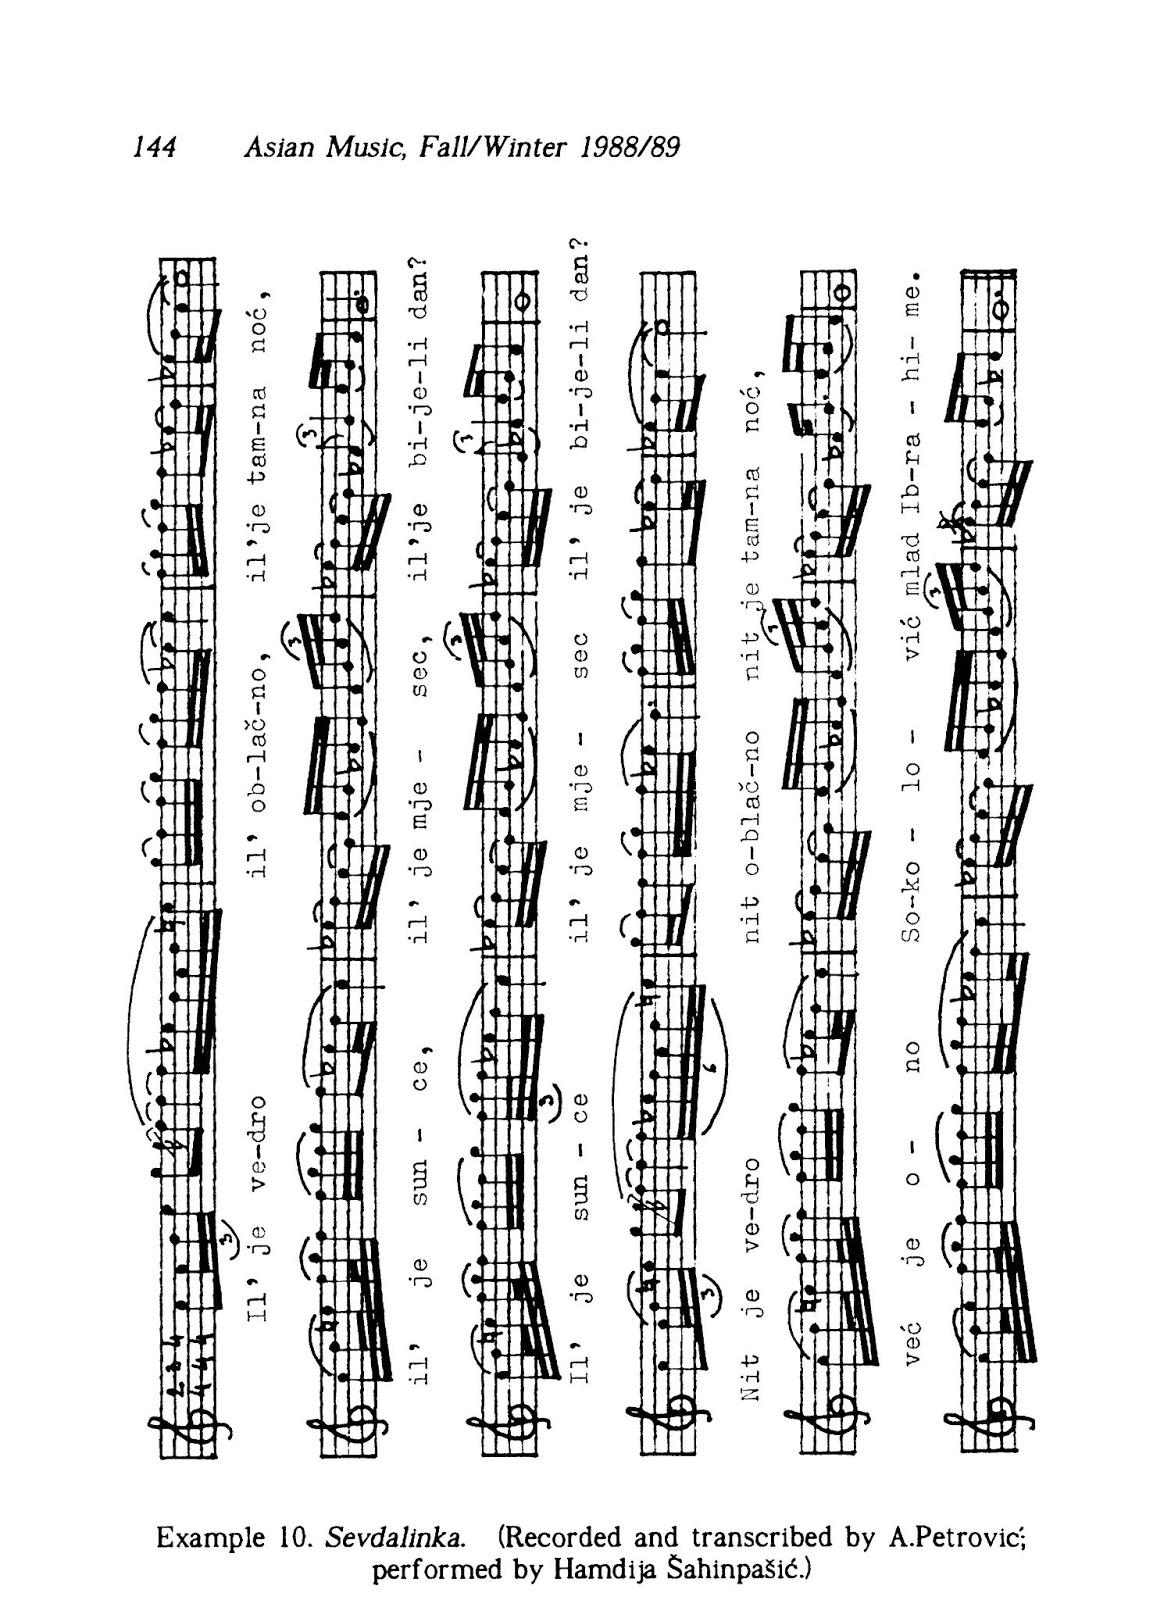 sevdalinke  ankica petrovi u0107  paradoxes of muslim music in boznia and herzegovina  asian music